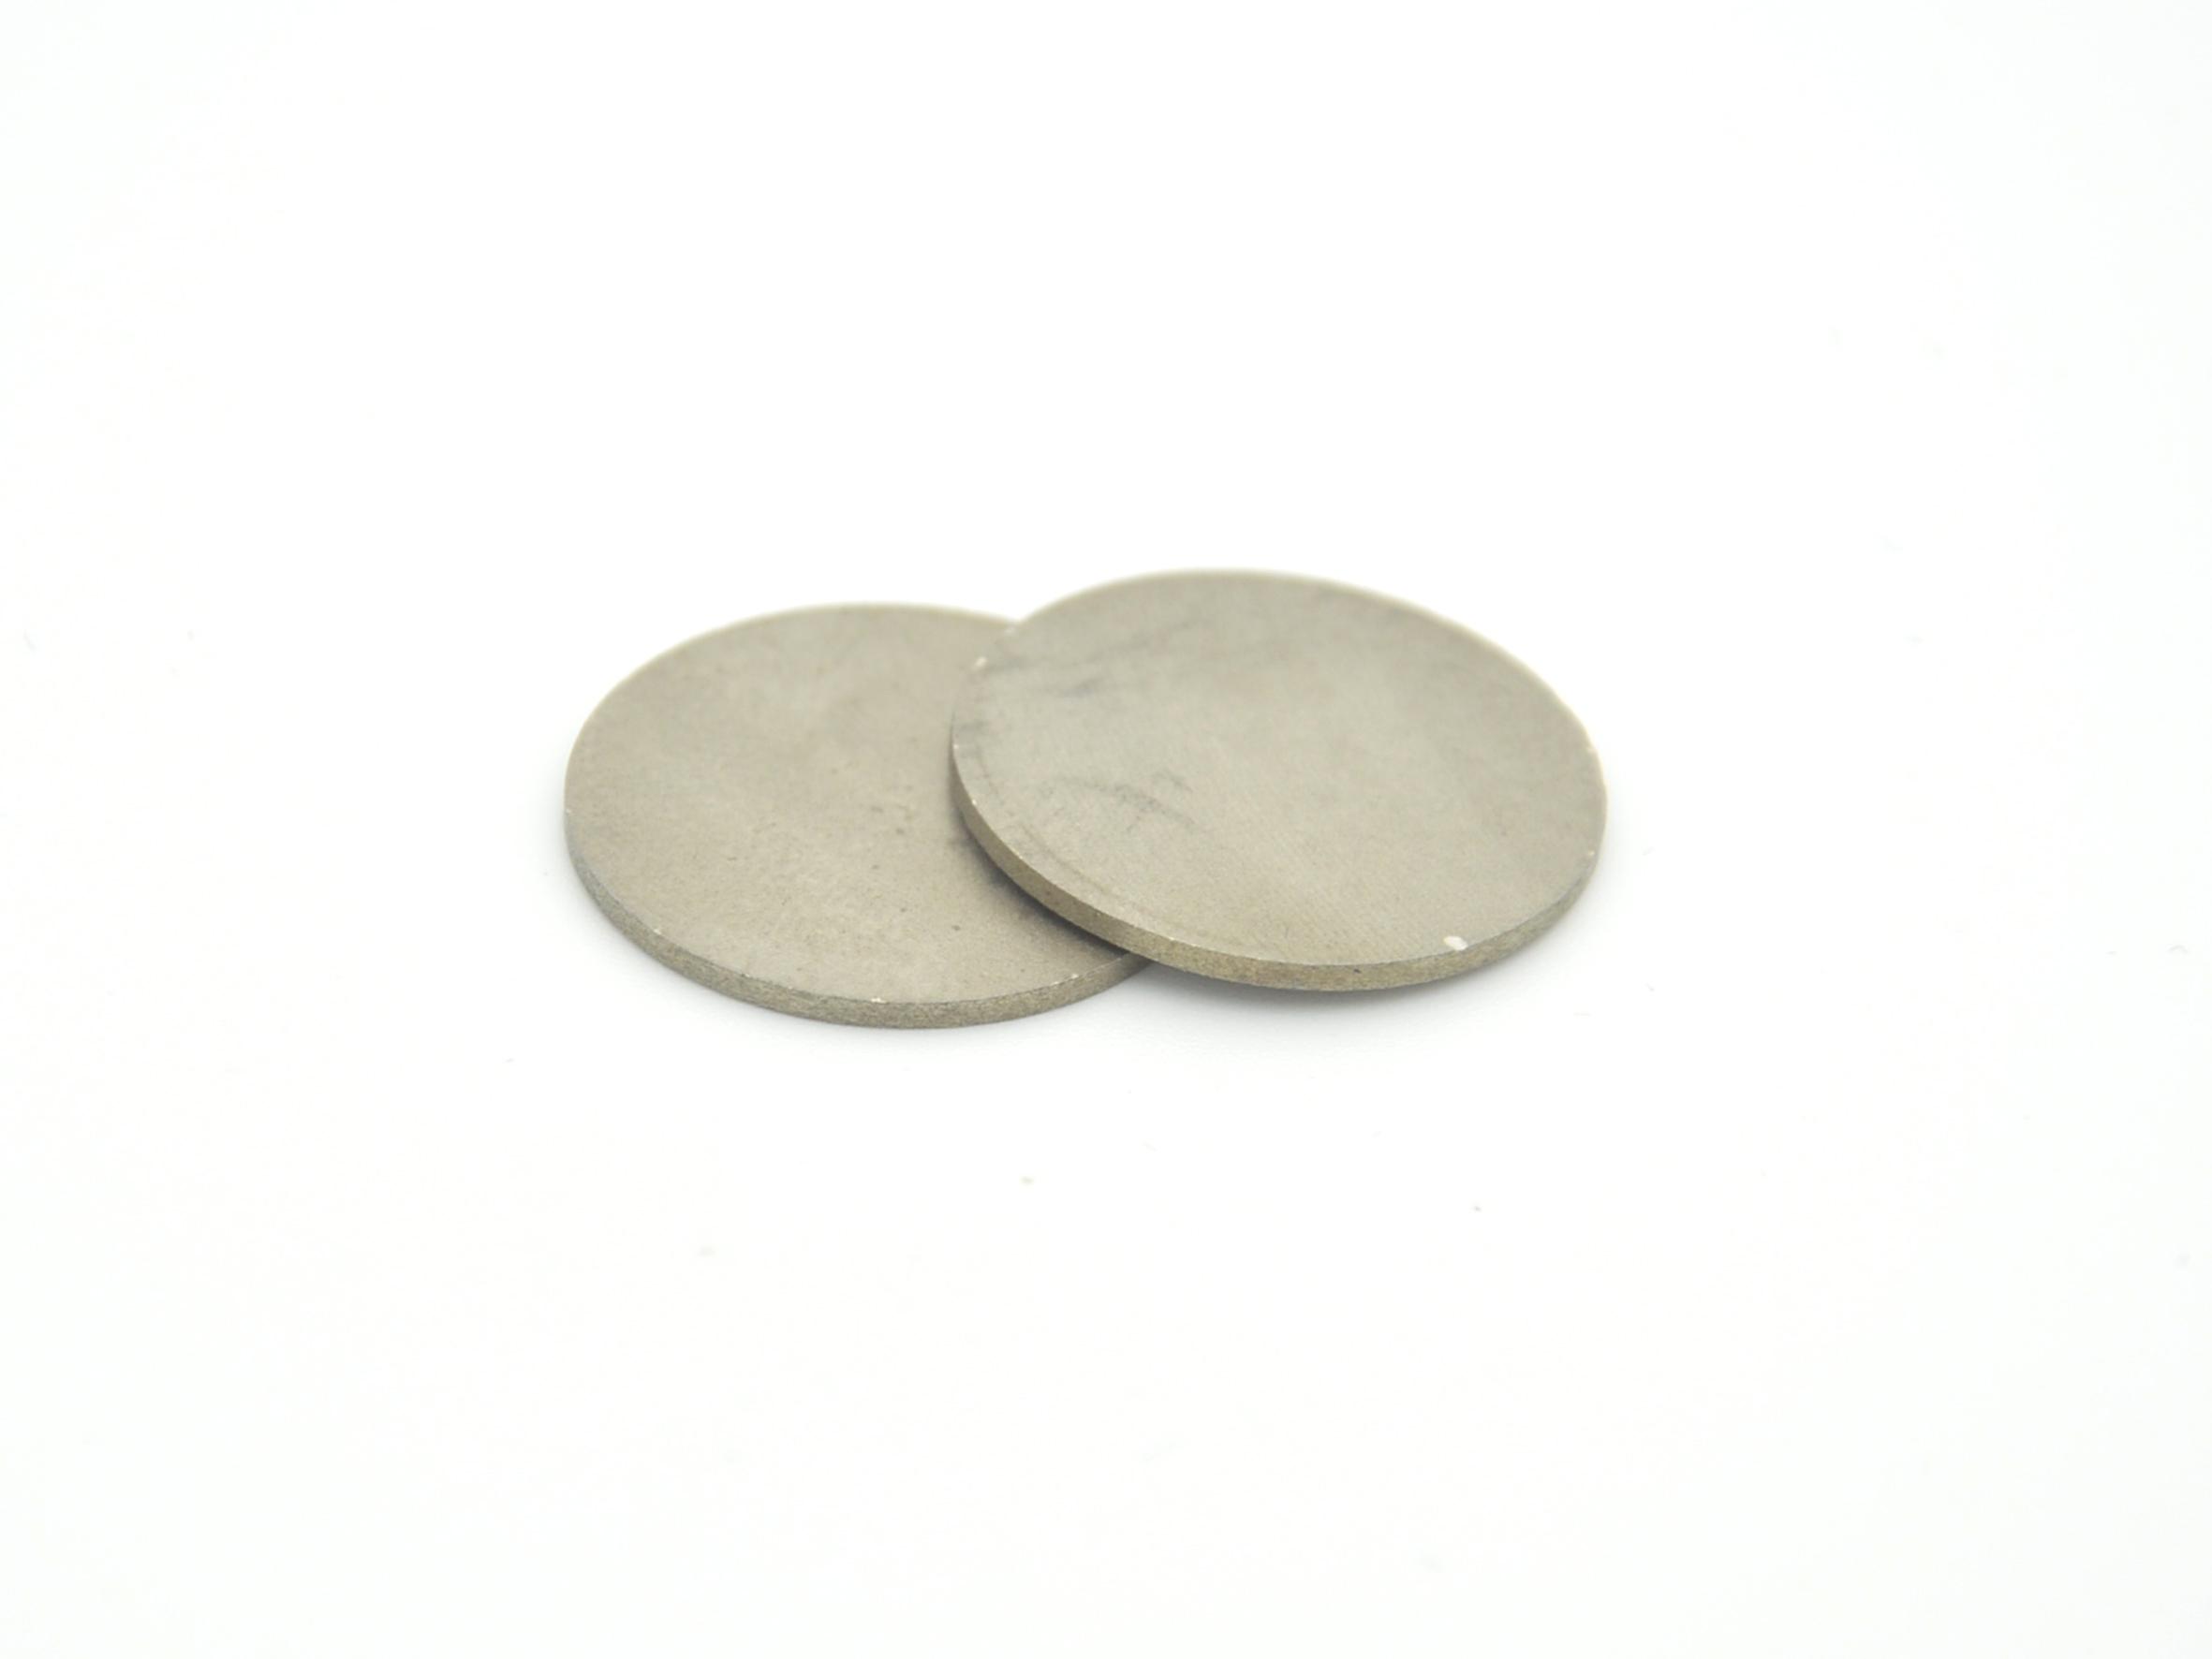 China disc samarium cobalt magnets